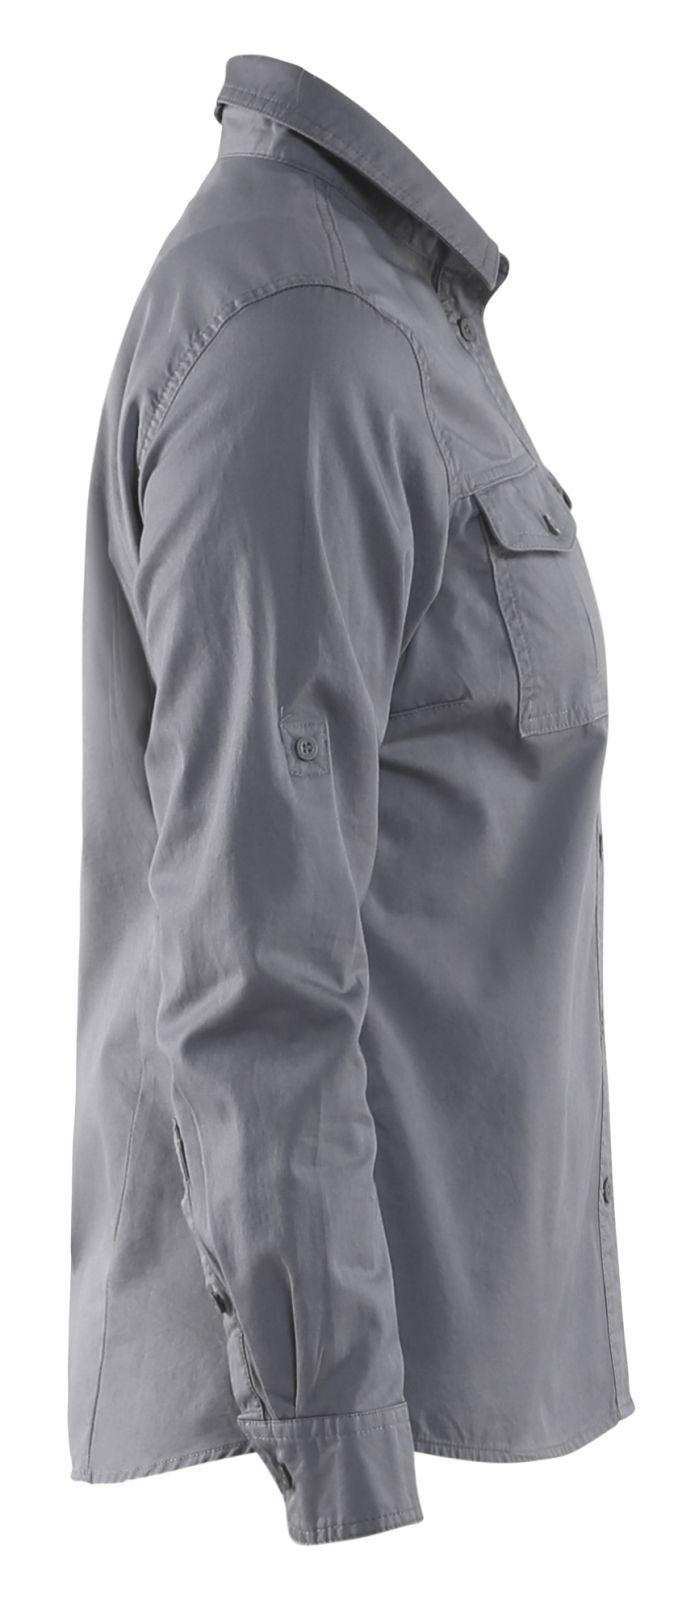 Blaklader Dames overhemden 32081135 grijs(9400)